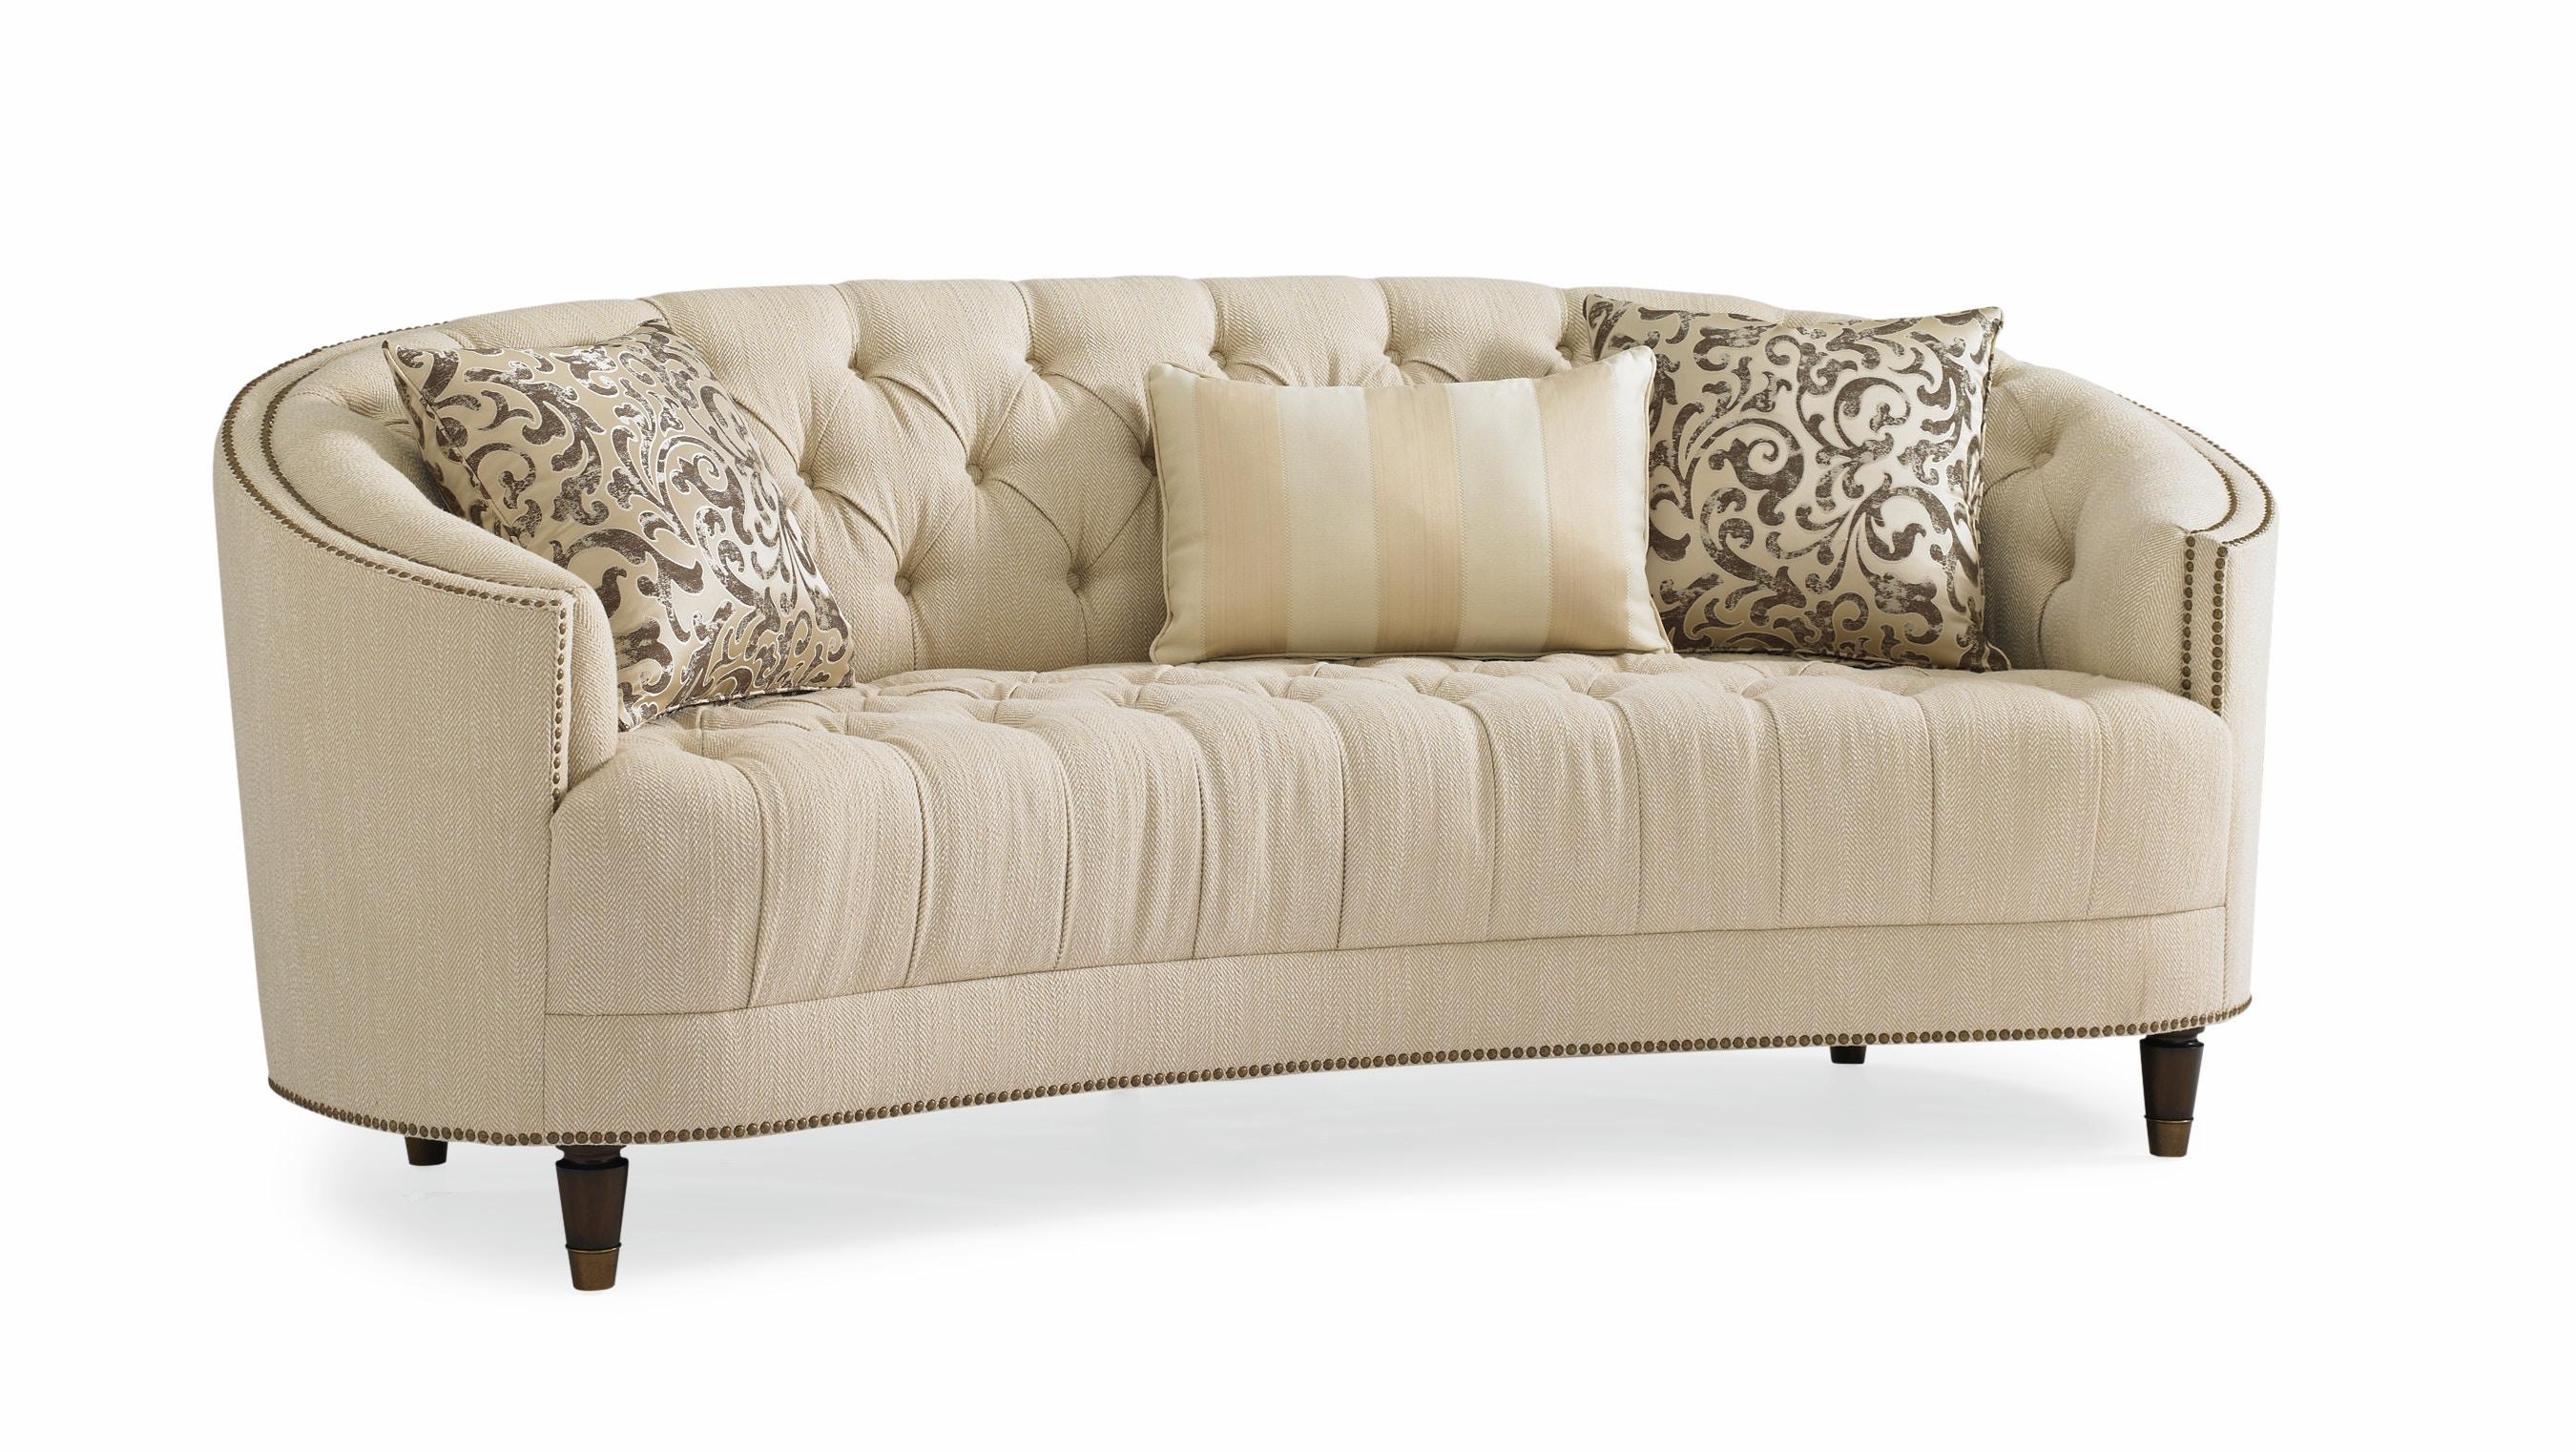 Schnadig Sofa 9090 182 G From Walter E. Smithe Furniture + Design